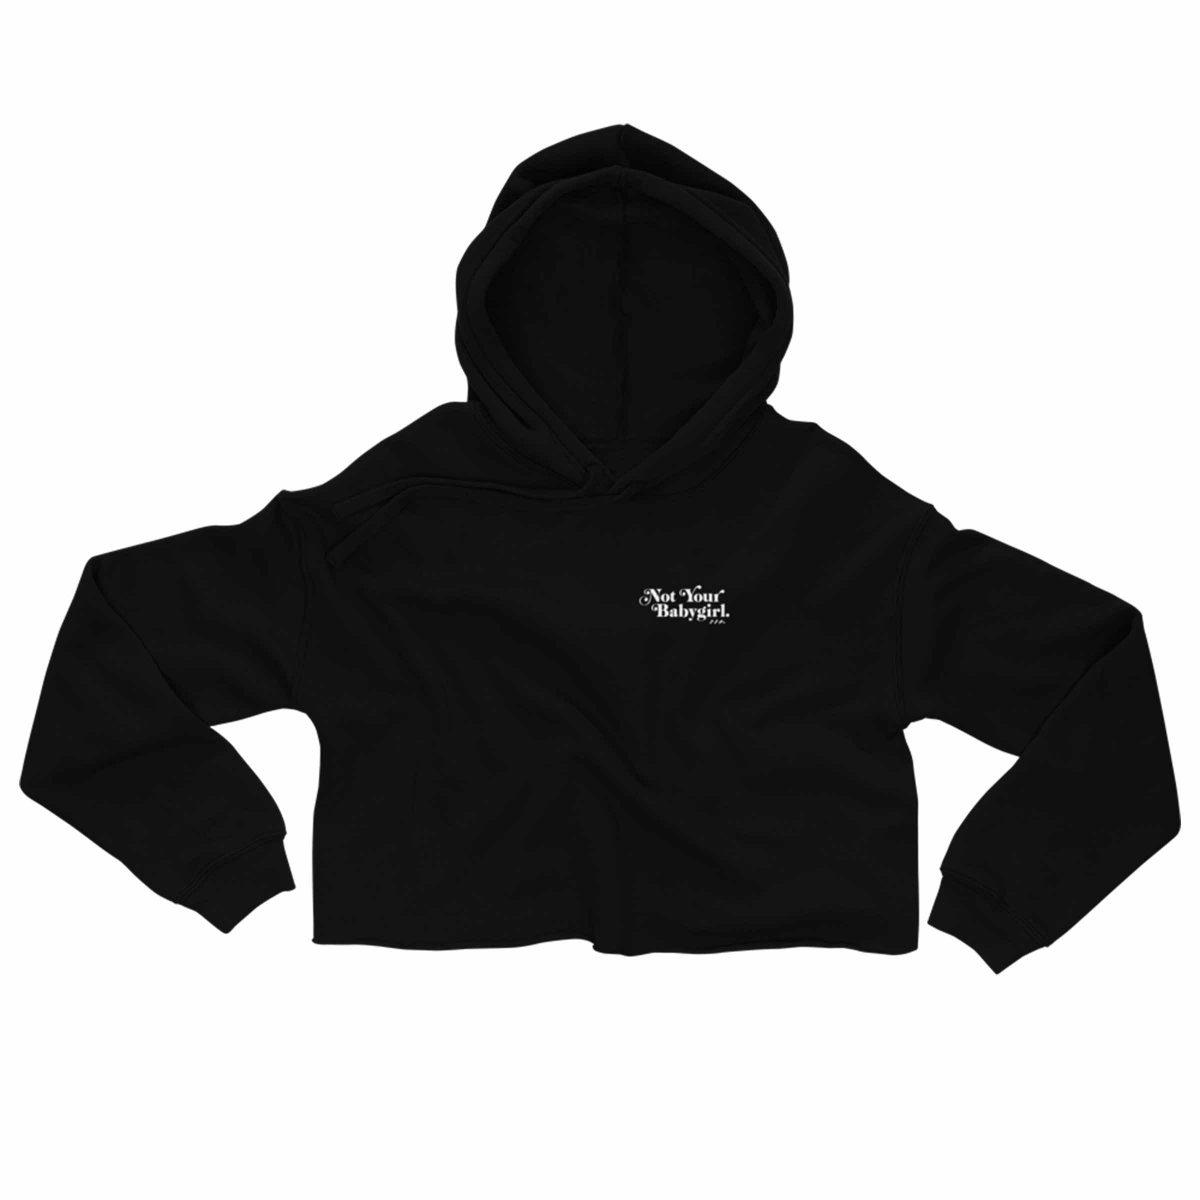 NOT YOUR BABYGIRL soft crop hoodies by kikicutt sweatshirt store